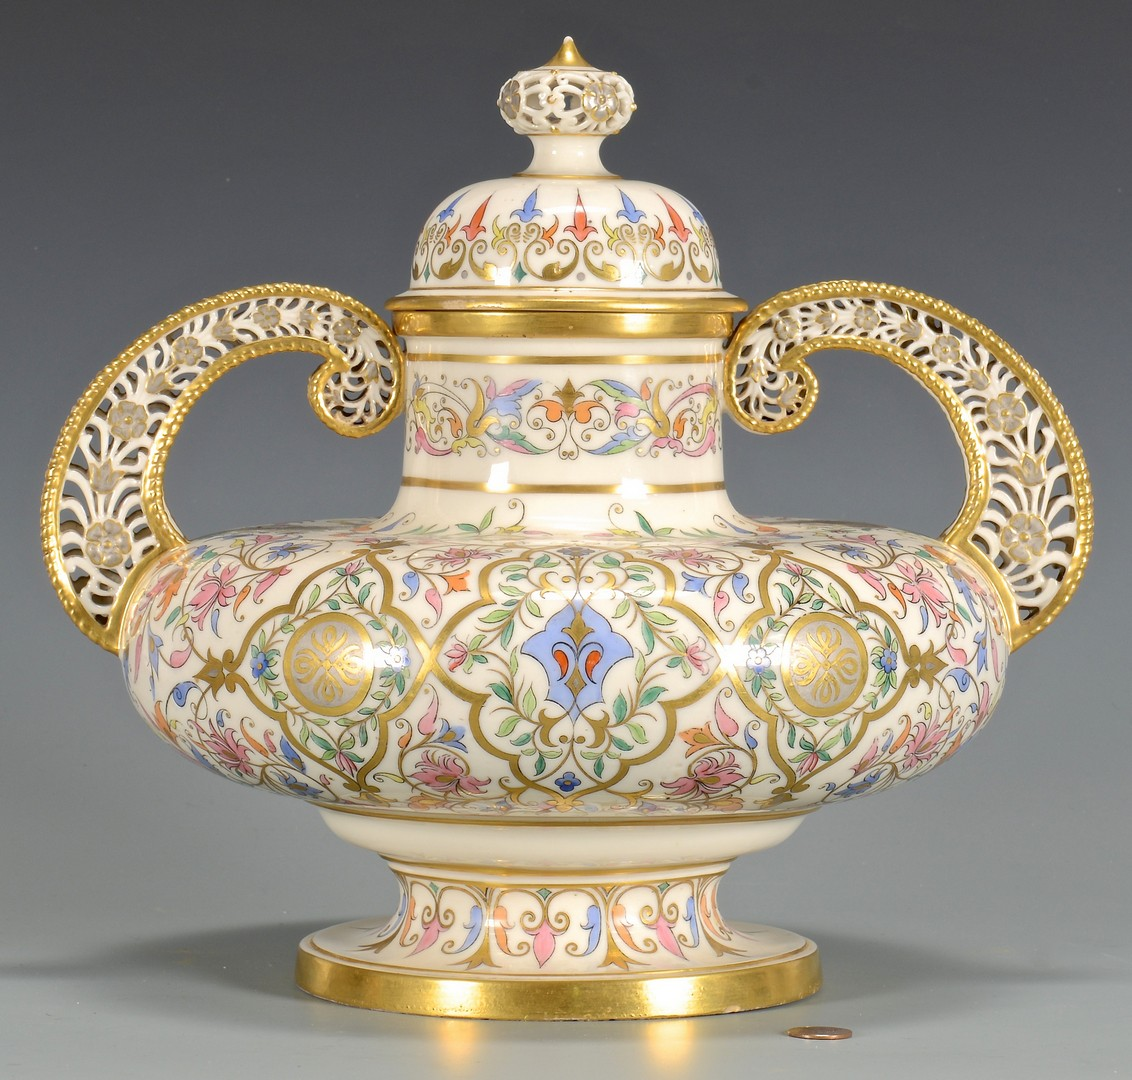 Lot 144: Royal Crown Derby Covered Urn